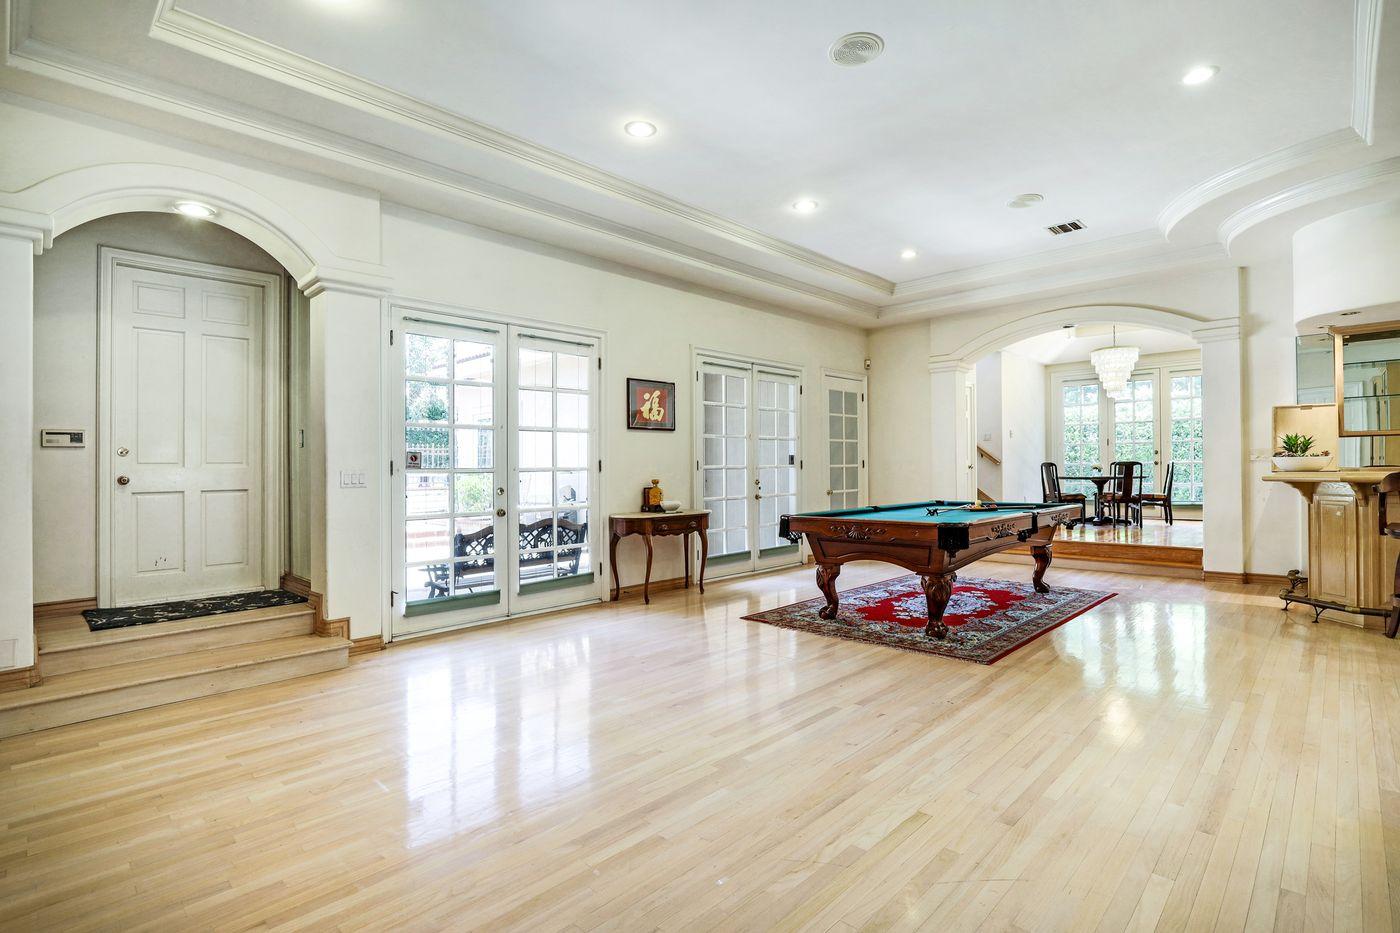 real-estate-photography-2245 Kingsbridge Ct-San Dimas-91773-airbnb-rental-interior-design-photographer-kasi-hyrapett-17